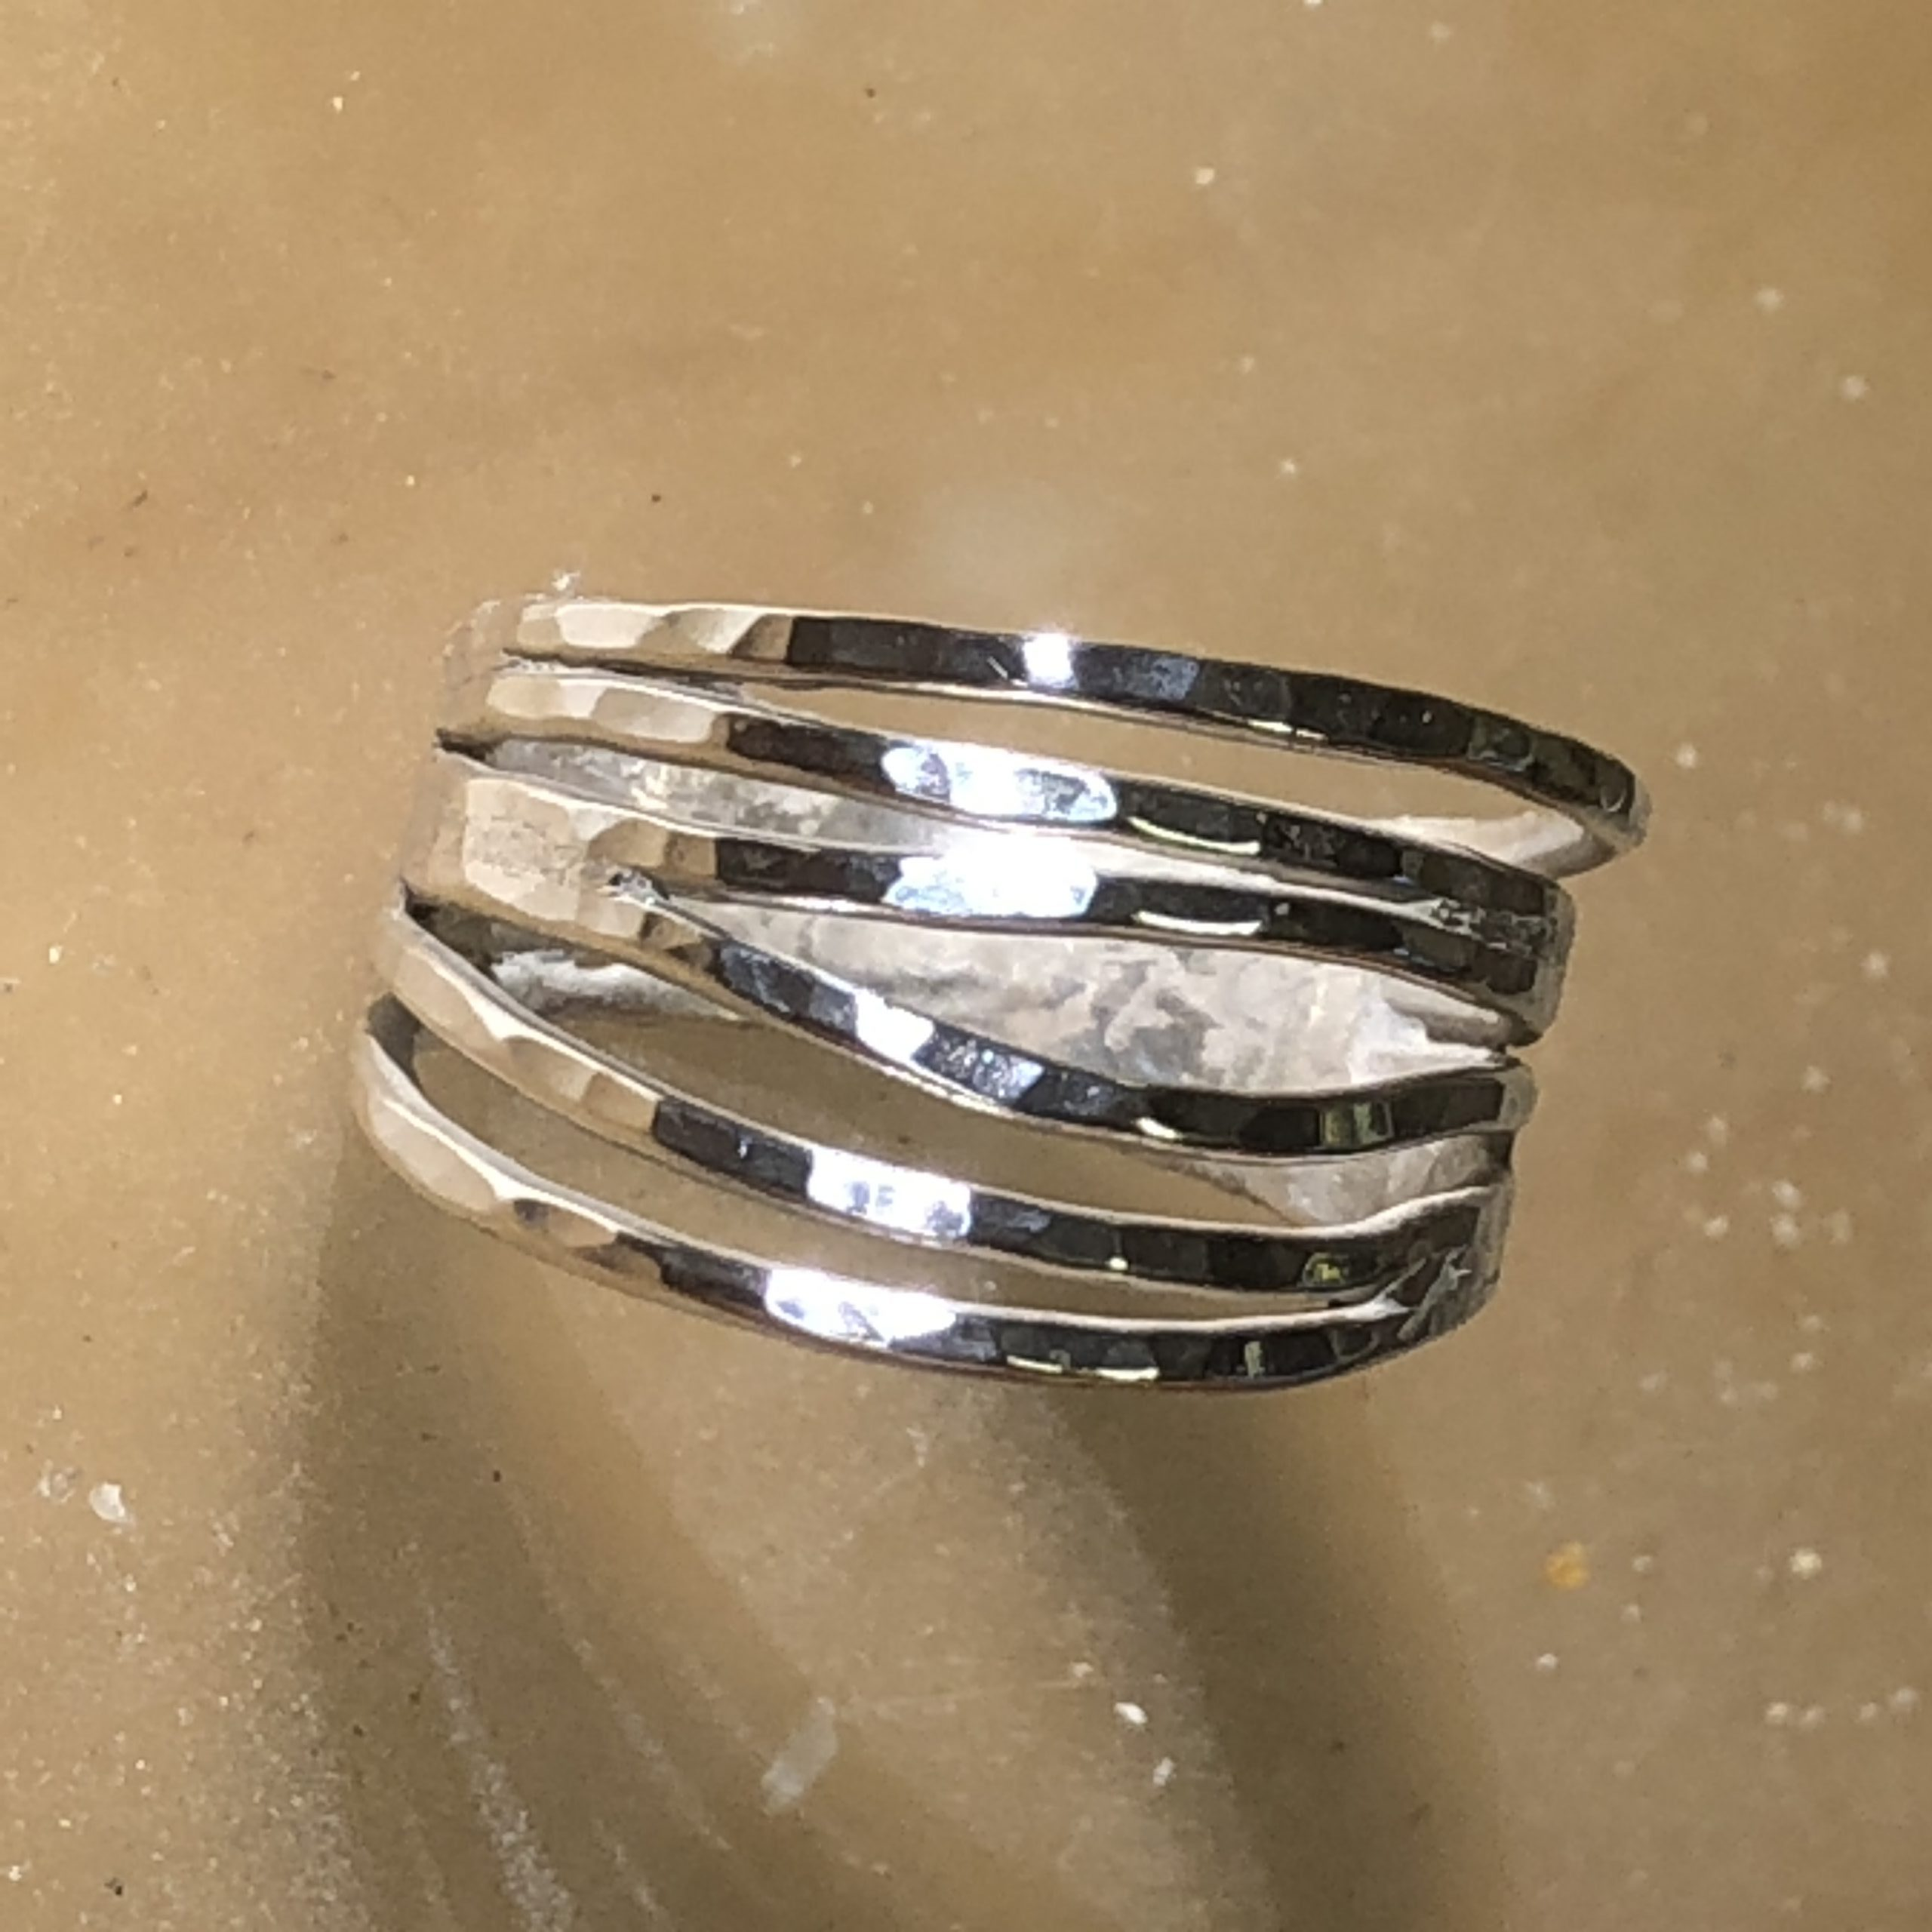 Multiring, silver